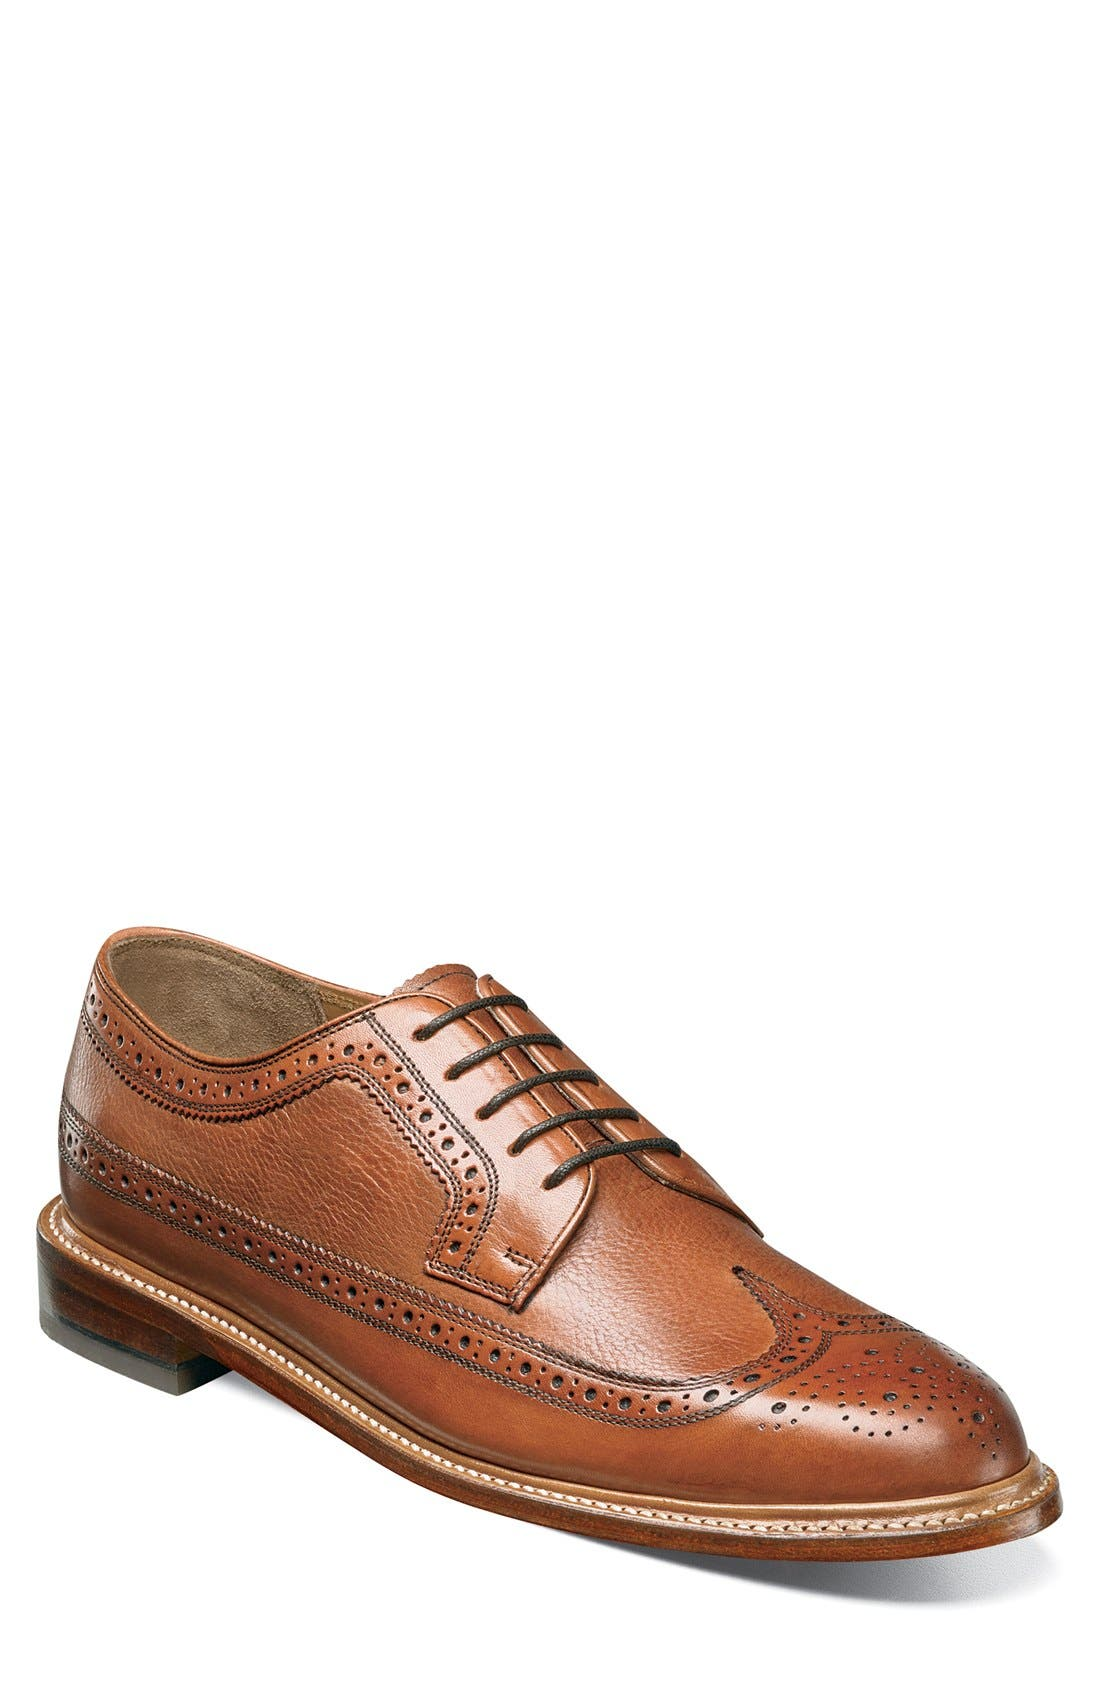 'Heritage' Wingtip,                             Main thumbnail 1, color,                             Cognac Leather